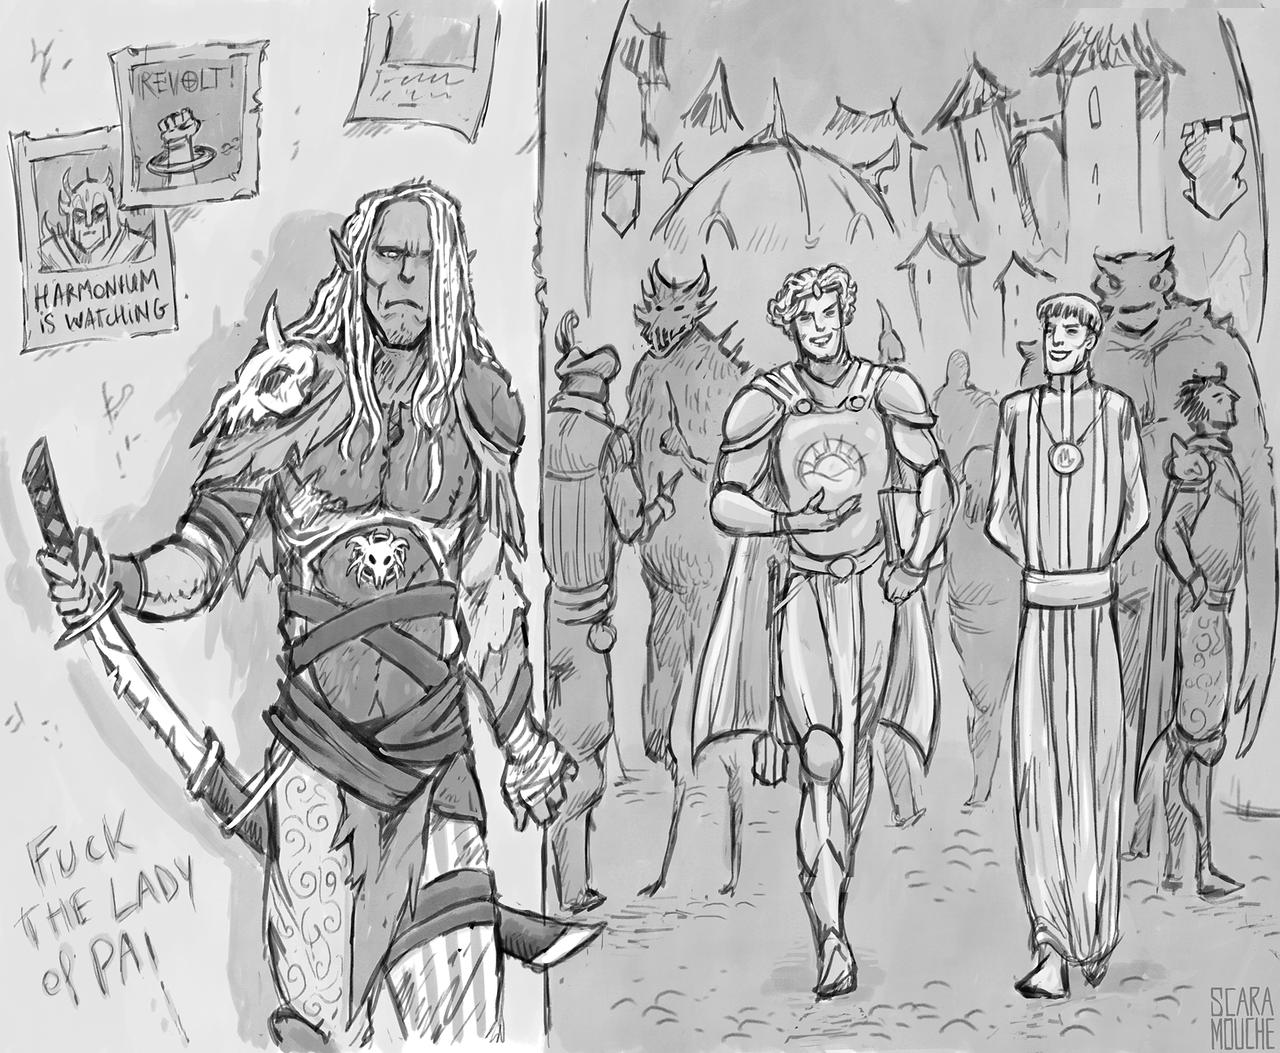 "saintrabouin Scara Mouche ""The Chant of Sigil: The brutal assassination of two priests by the Sinker 61"" - by Baptiste (Scara Mouche) saintrabouin.tumblr.com (2018-12) © dell'autore tutti i diritti riservati"